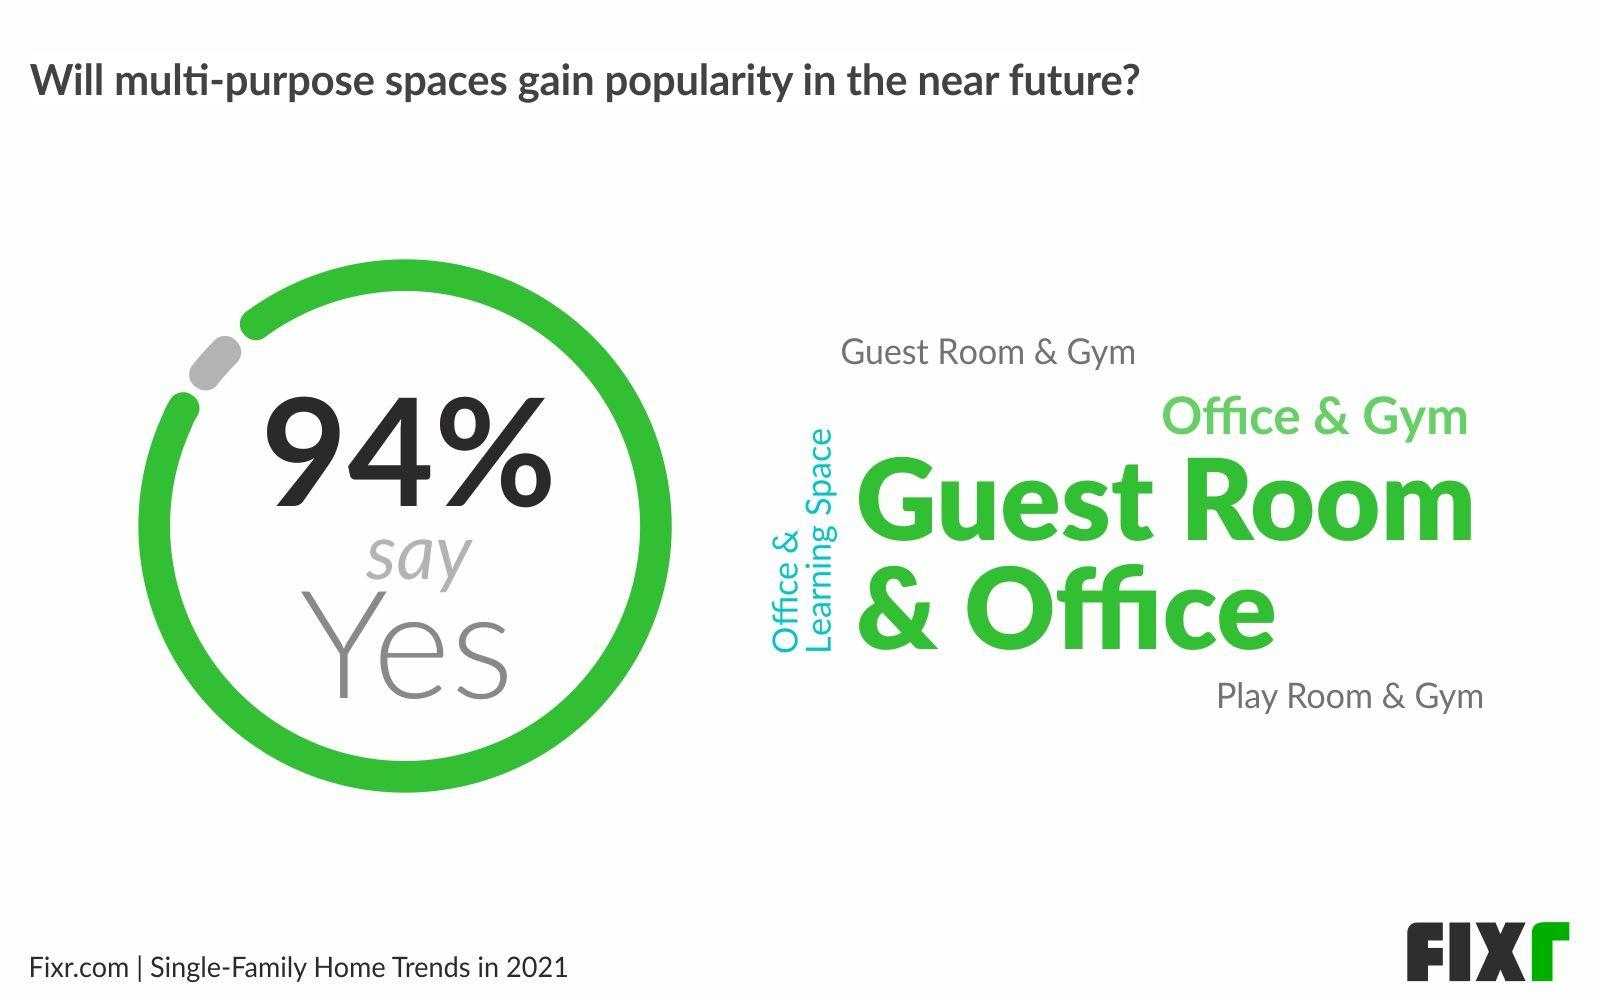 Home building trends 2021 - Multi-purpose spaces